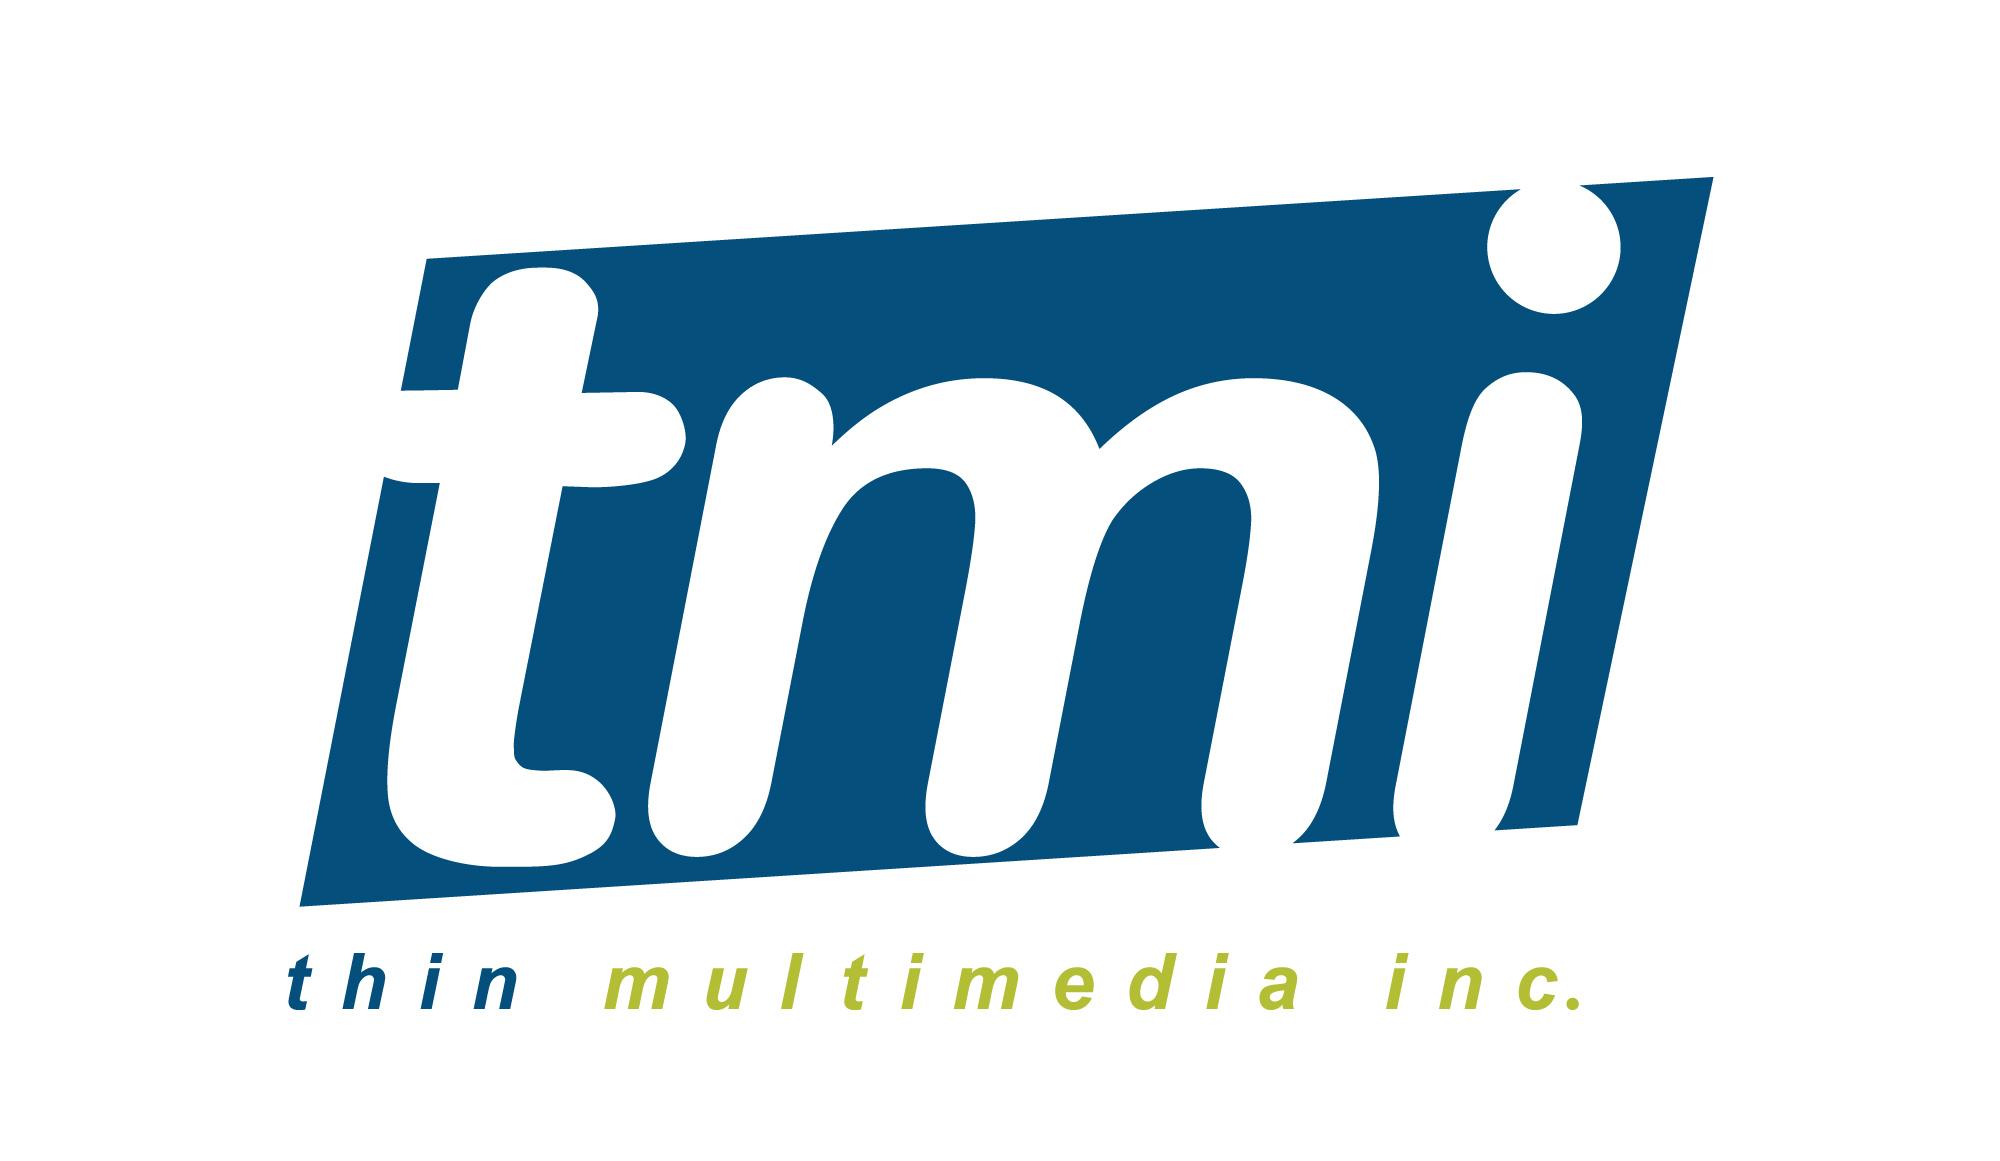 Thin Multimedia, Inc. (TMI)